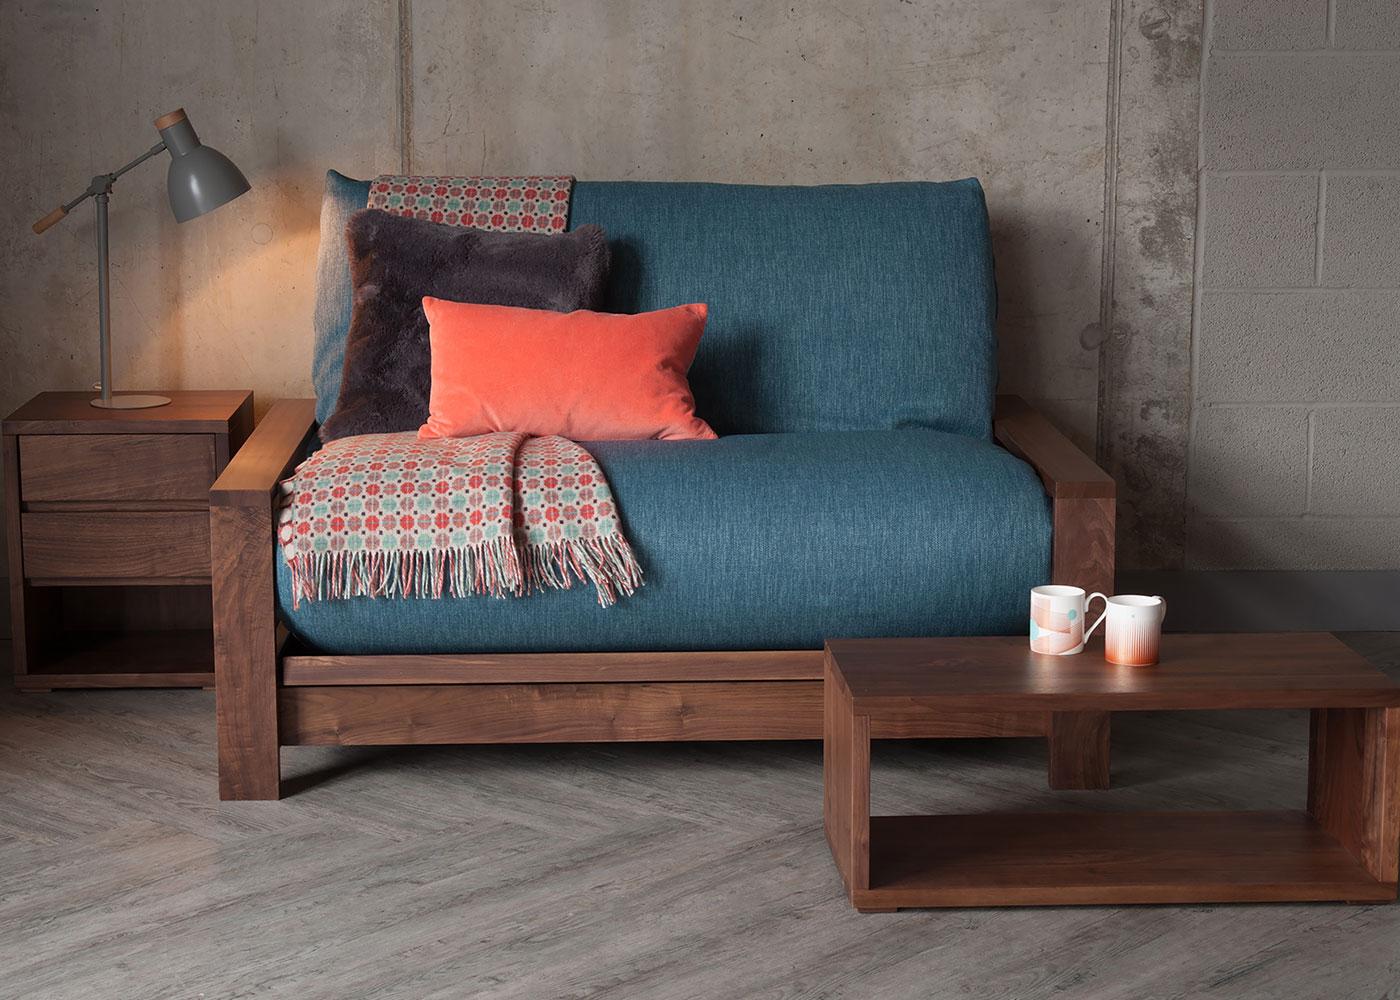 Black Lotus Panama futon sofa bed made from solid walnut